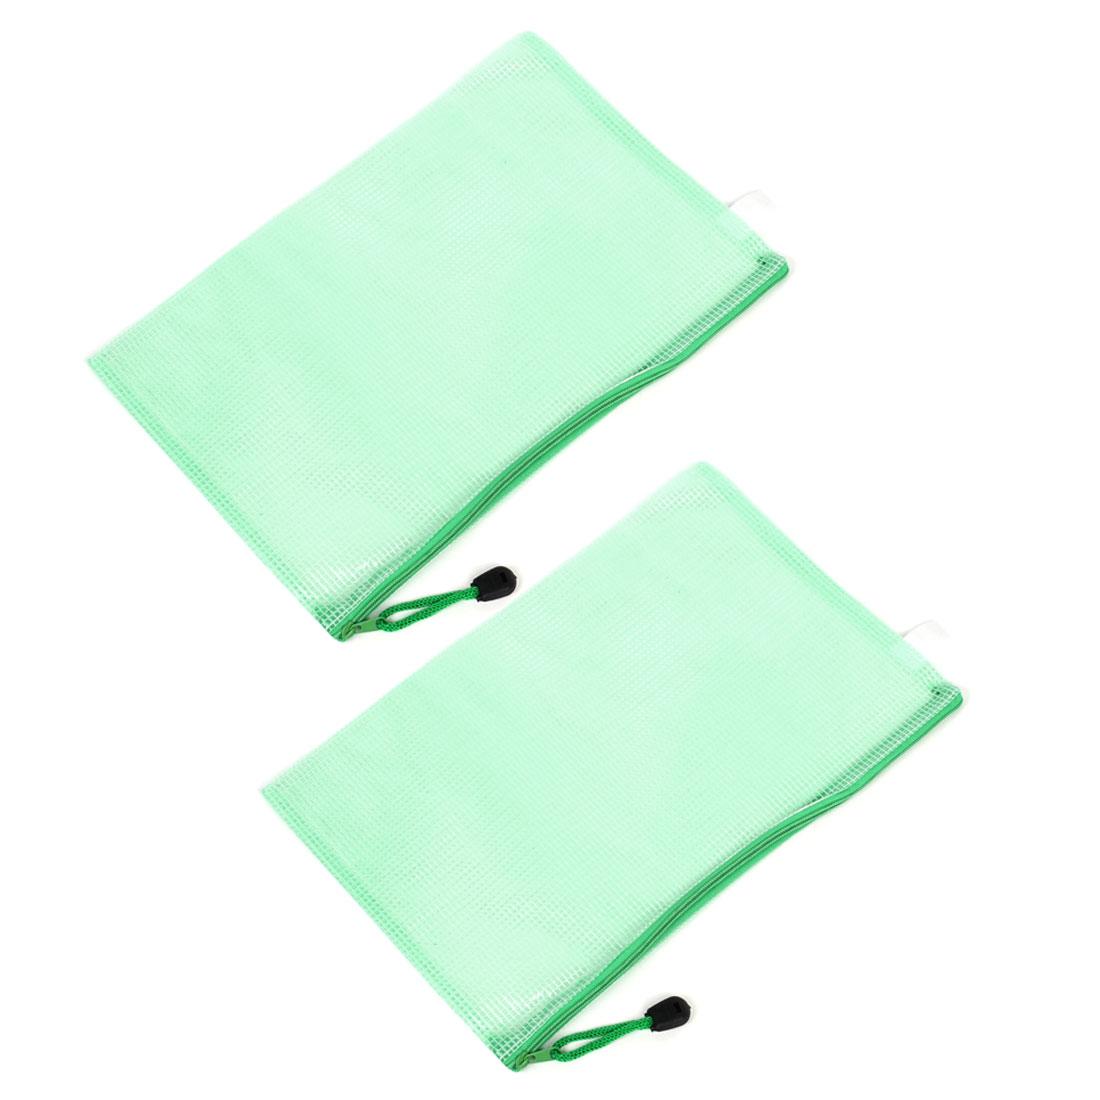 2 Pcs Clear Green Plastic Zip up B5 Paper File Bag w Nylon Strap